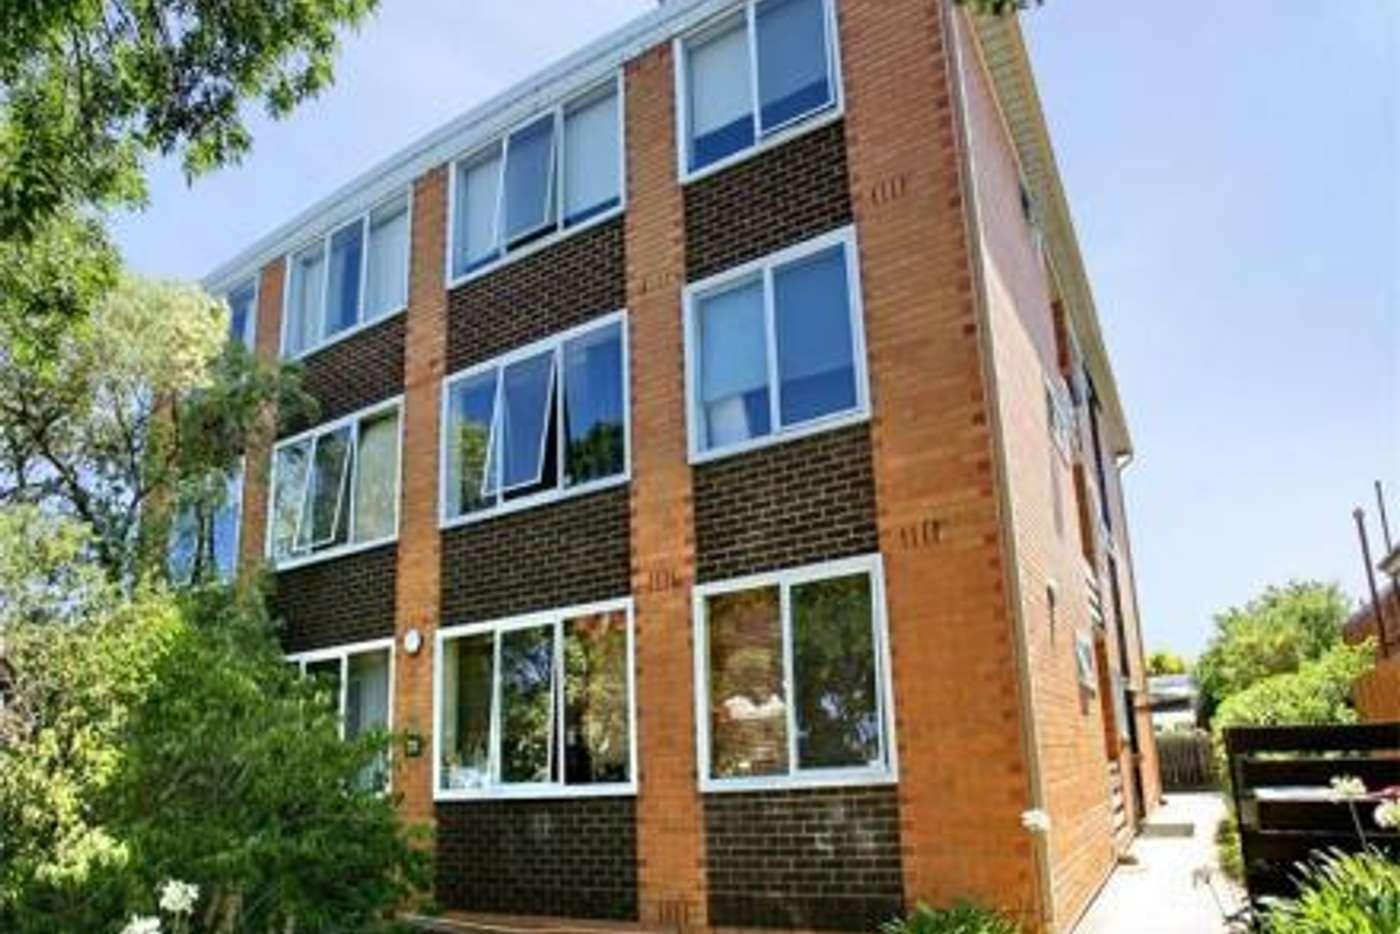 Main view of Homely apartment listing, 5/35 Donald Street, Prahran VIC 3181